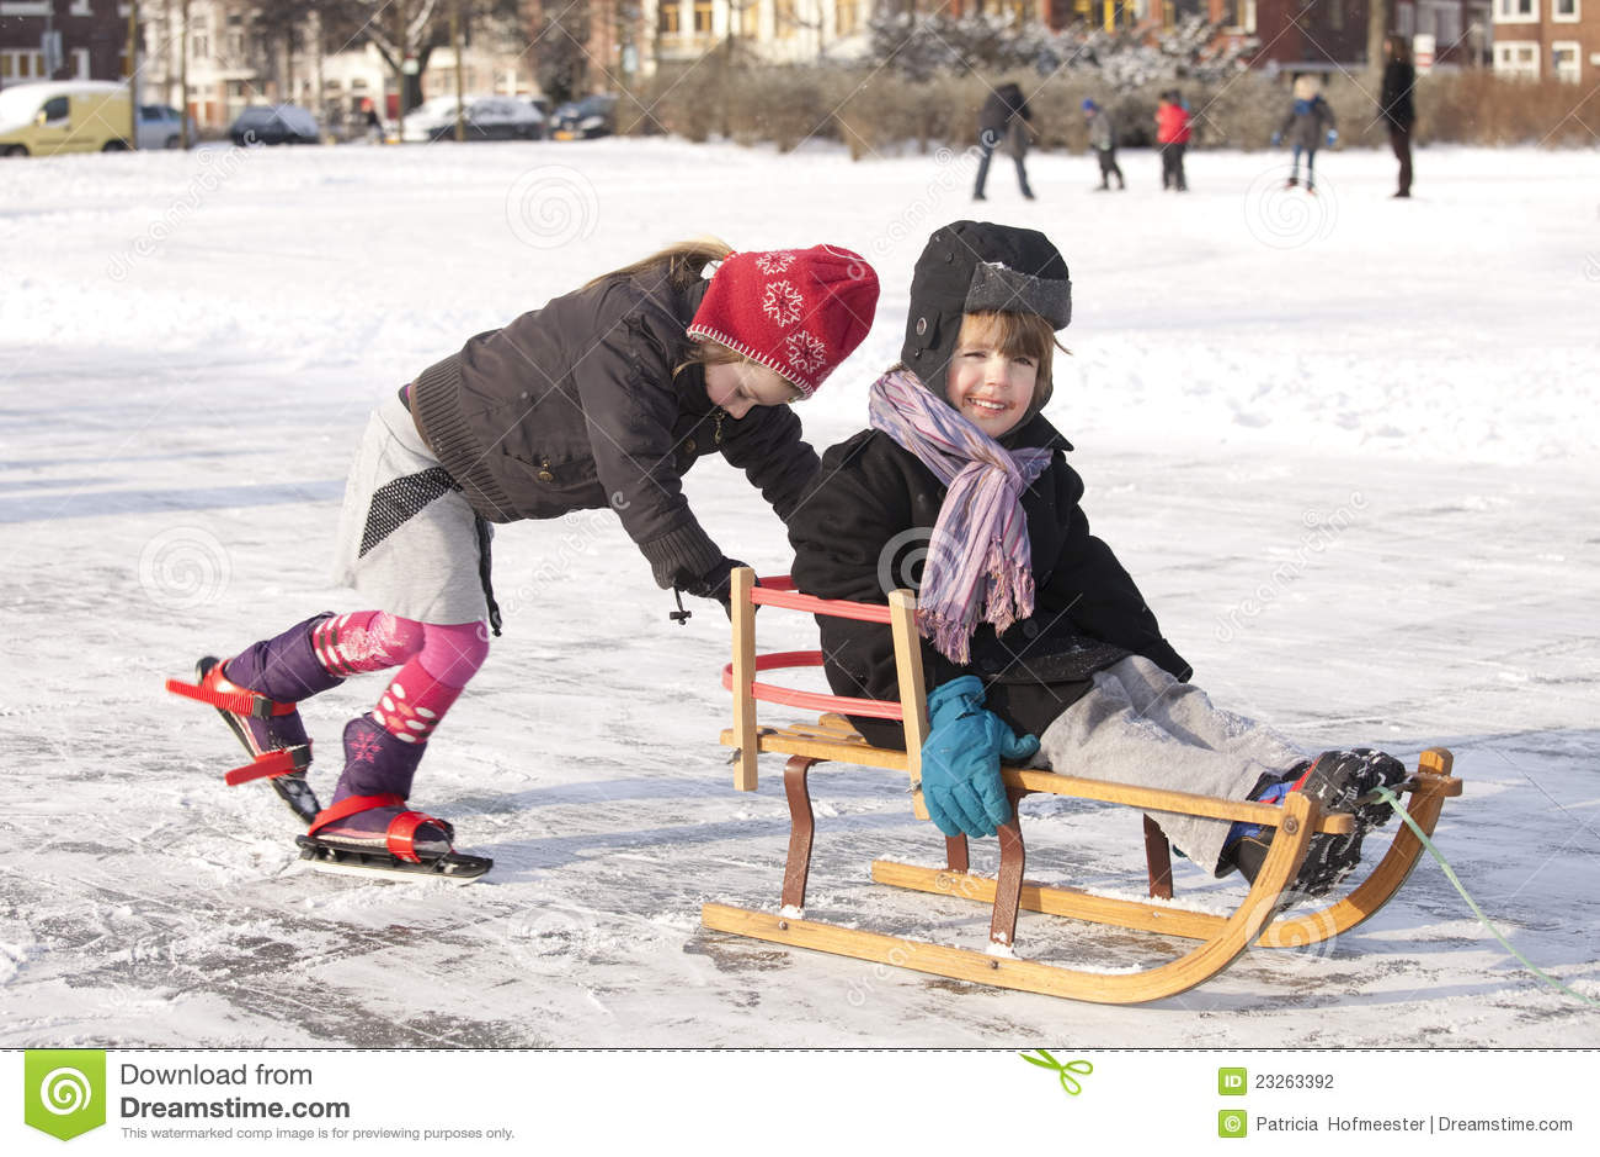 WInter fun on ice